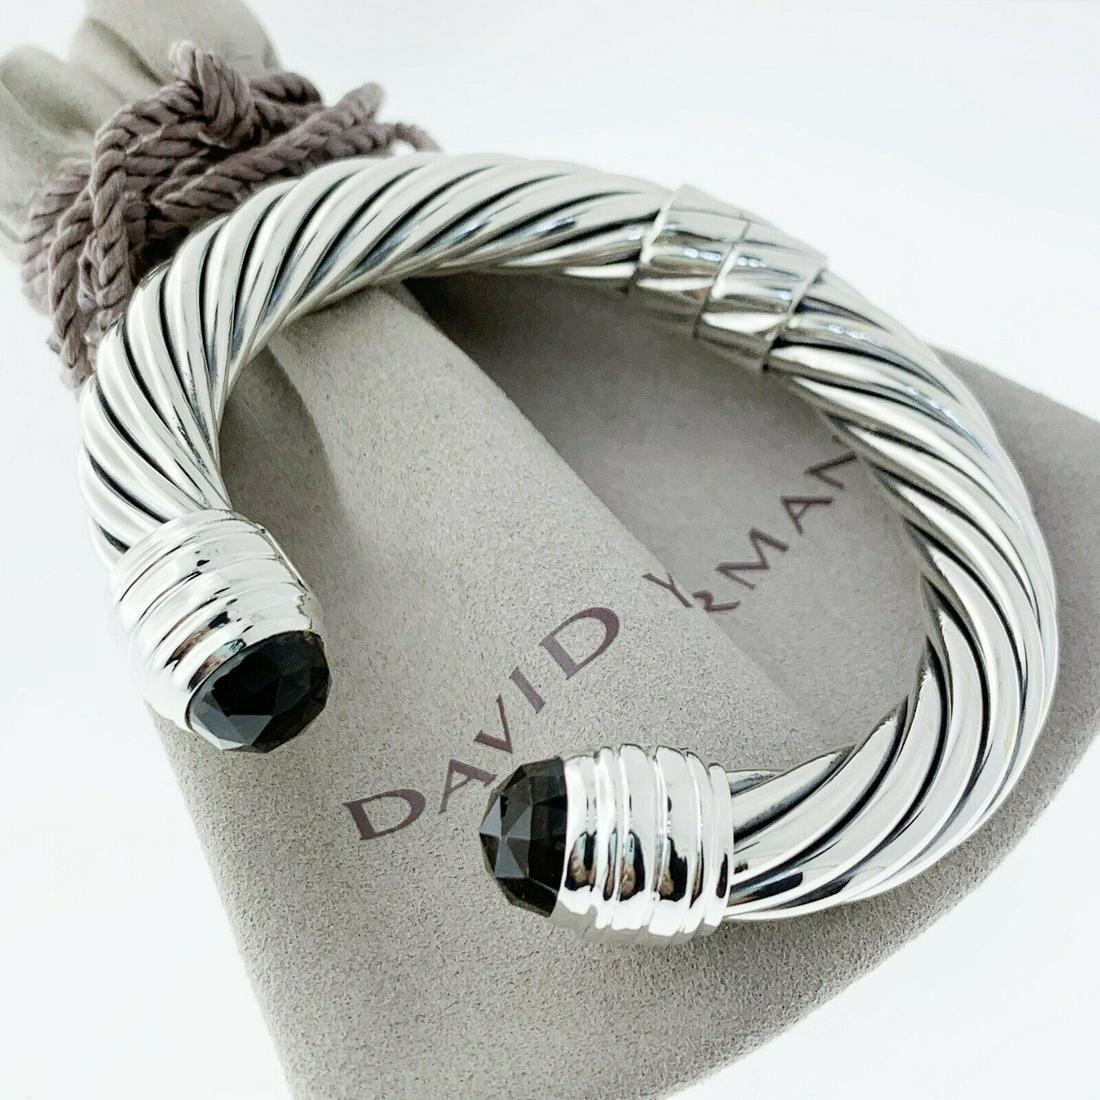 David Yurman Smoky and Diamond 10mm Cable Bracelet